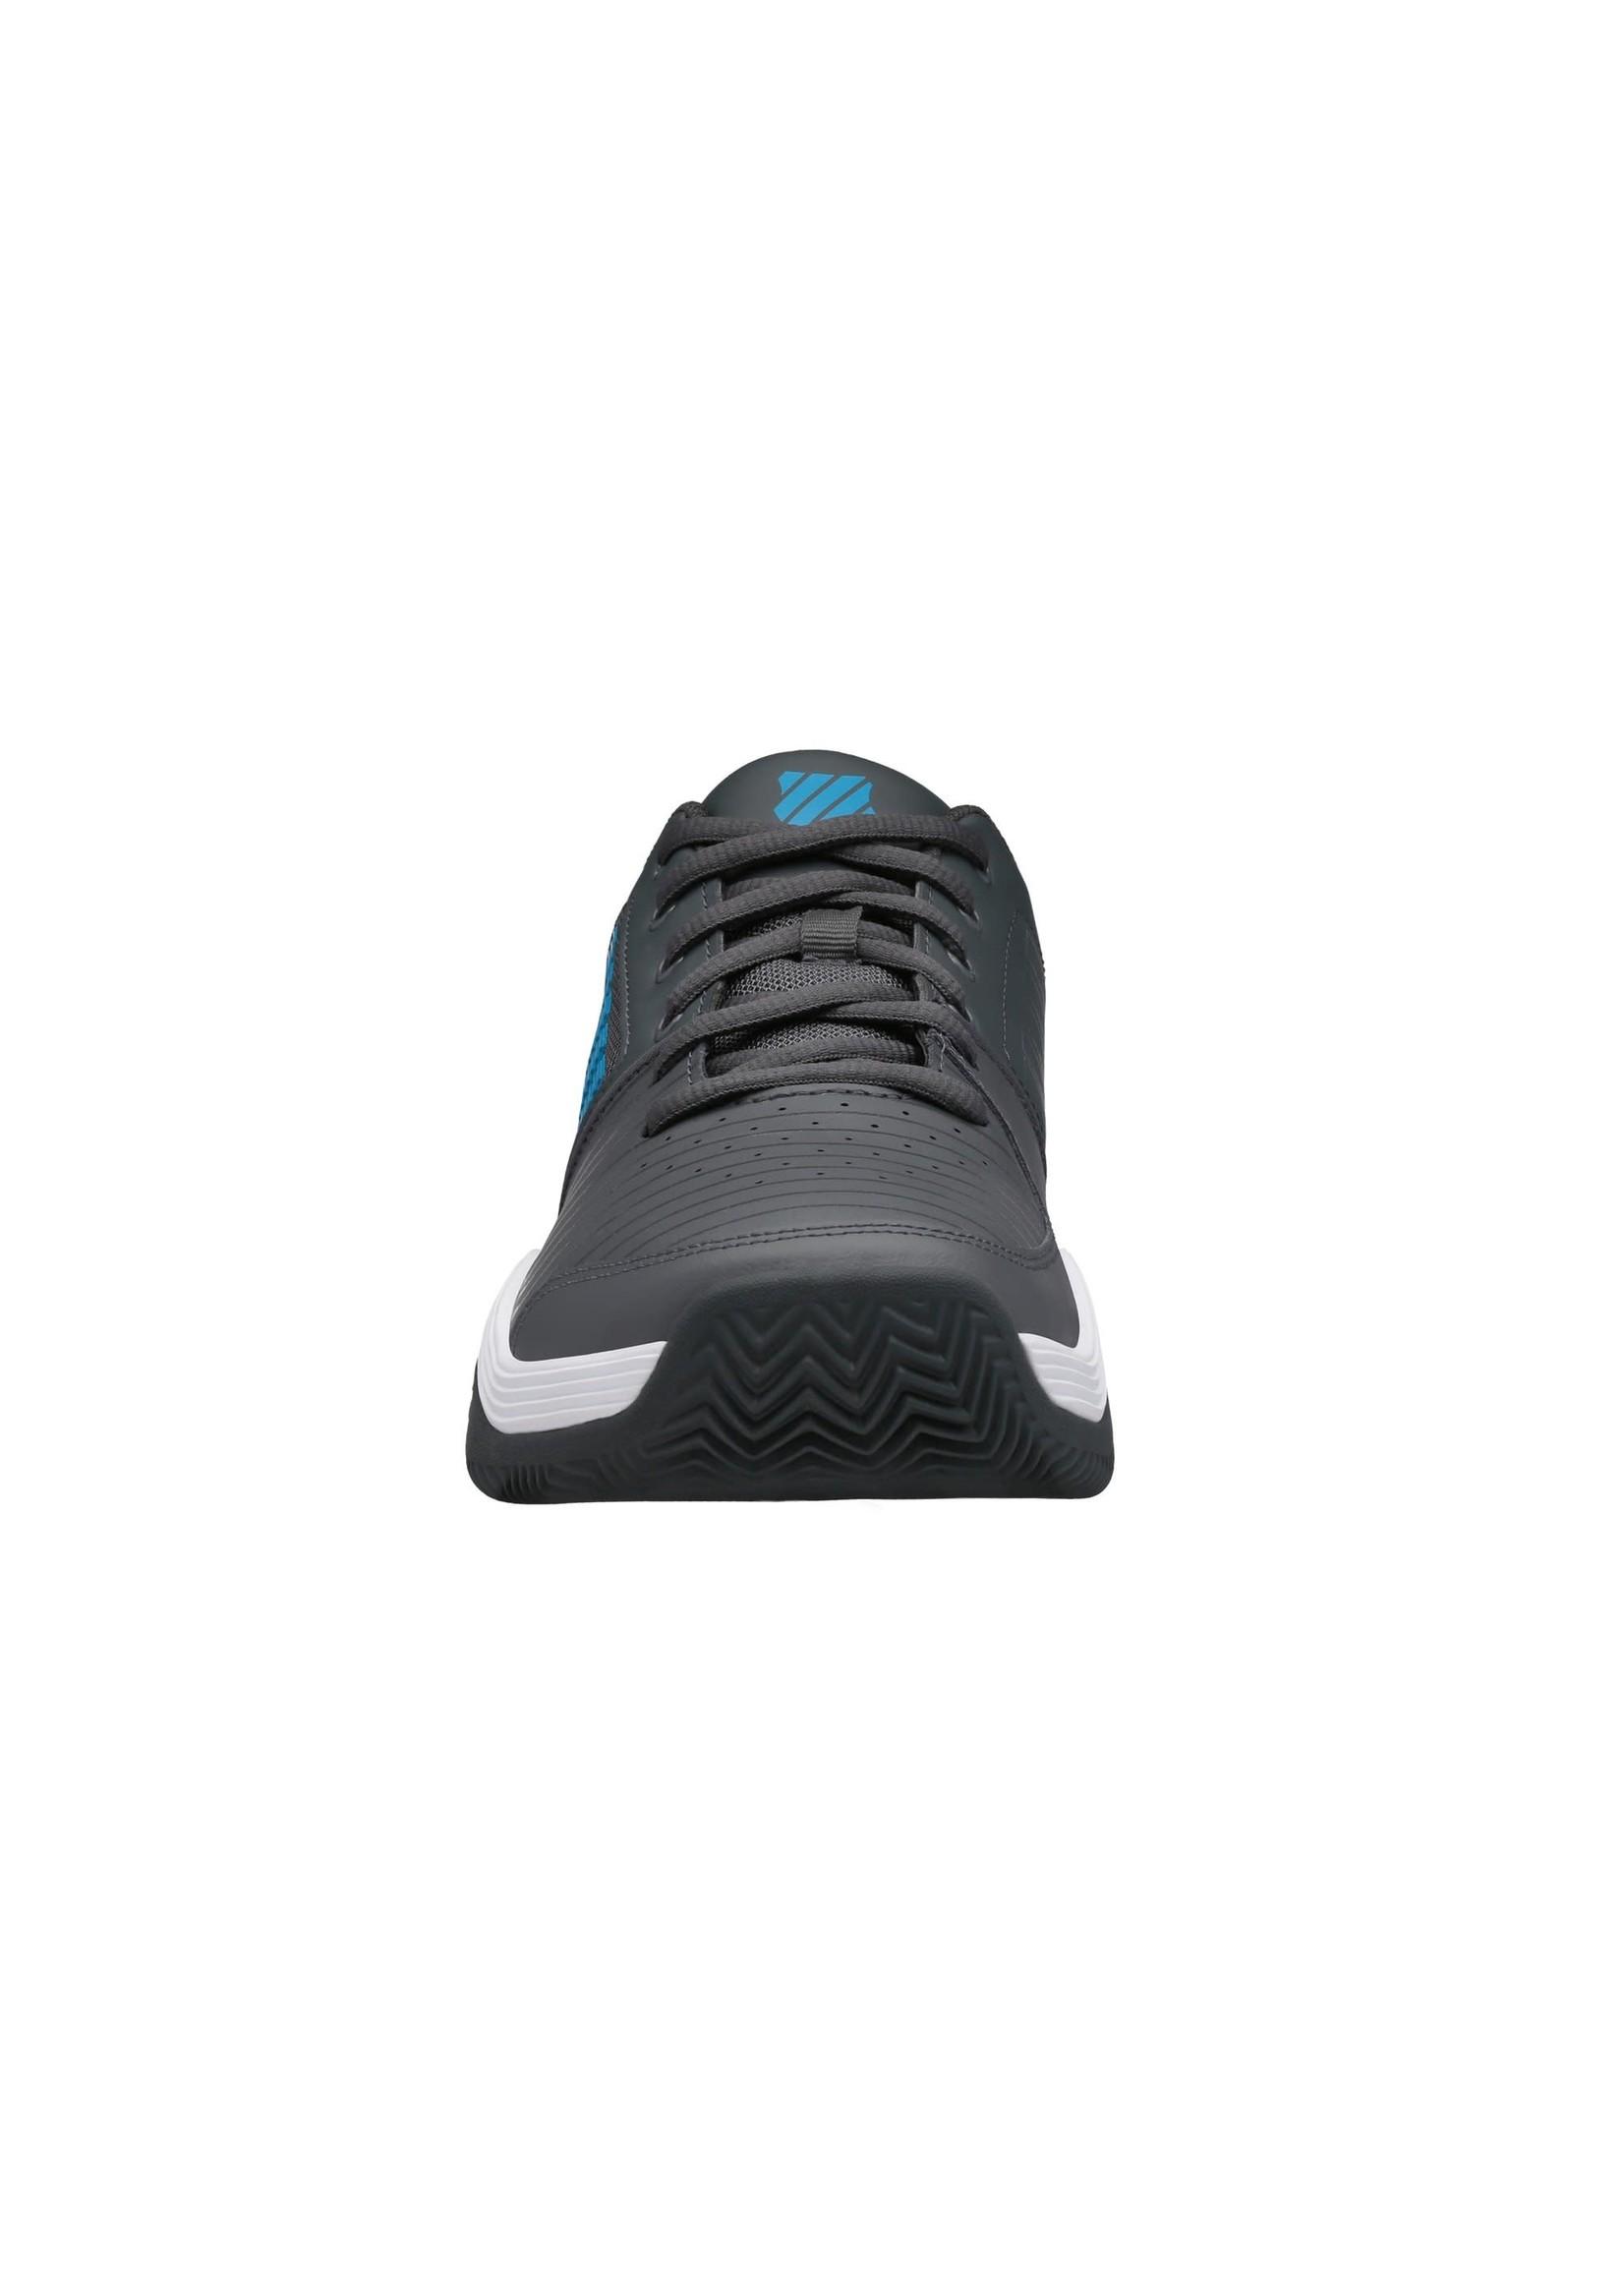 K Swiss K Swiss Court Express HB Men Tennis Shoe (2021) - Dark Shadow